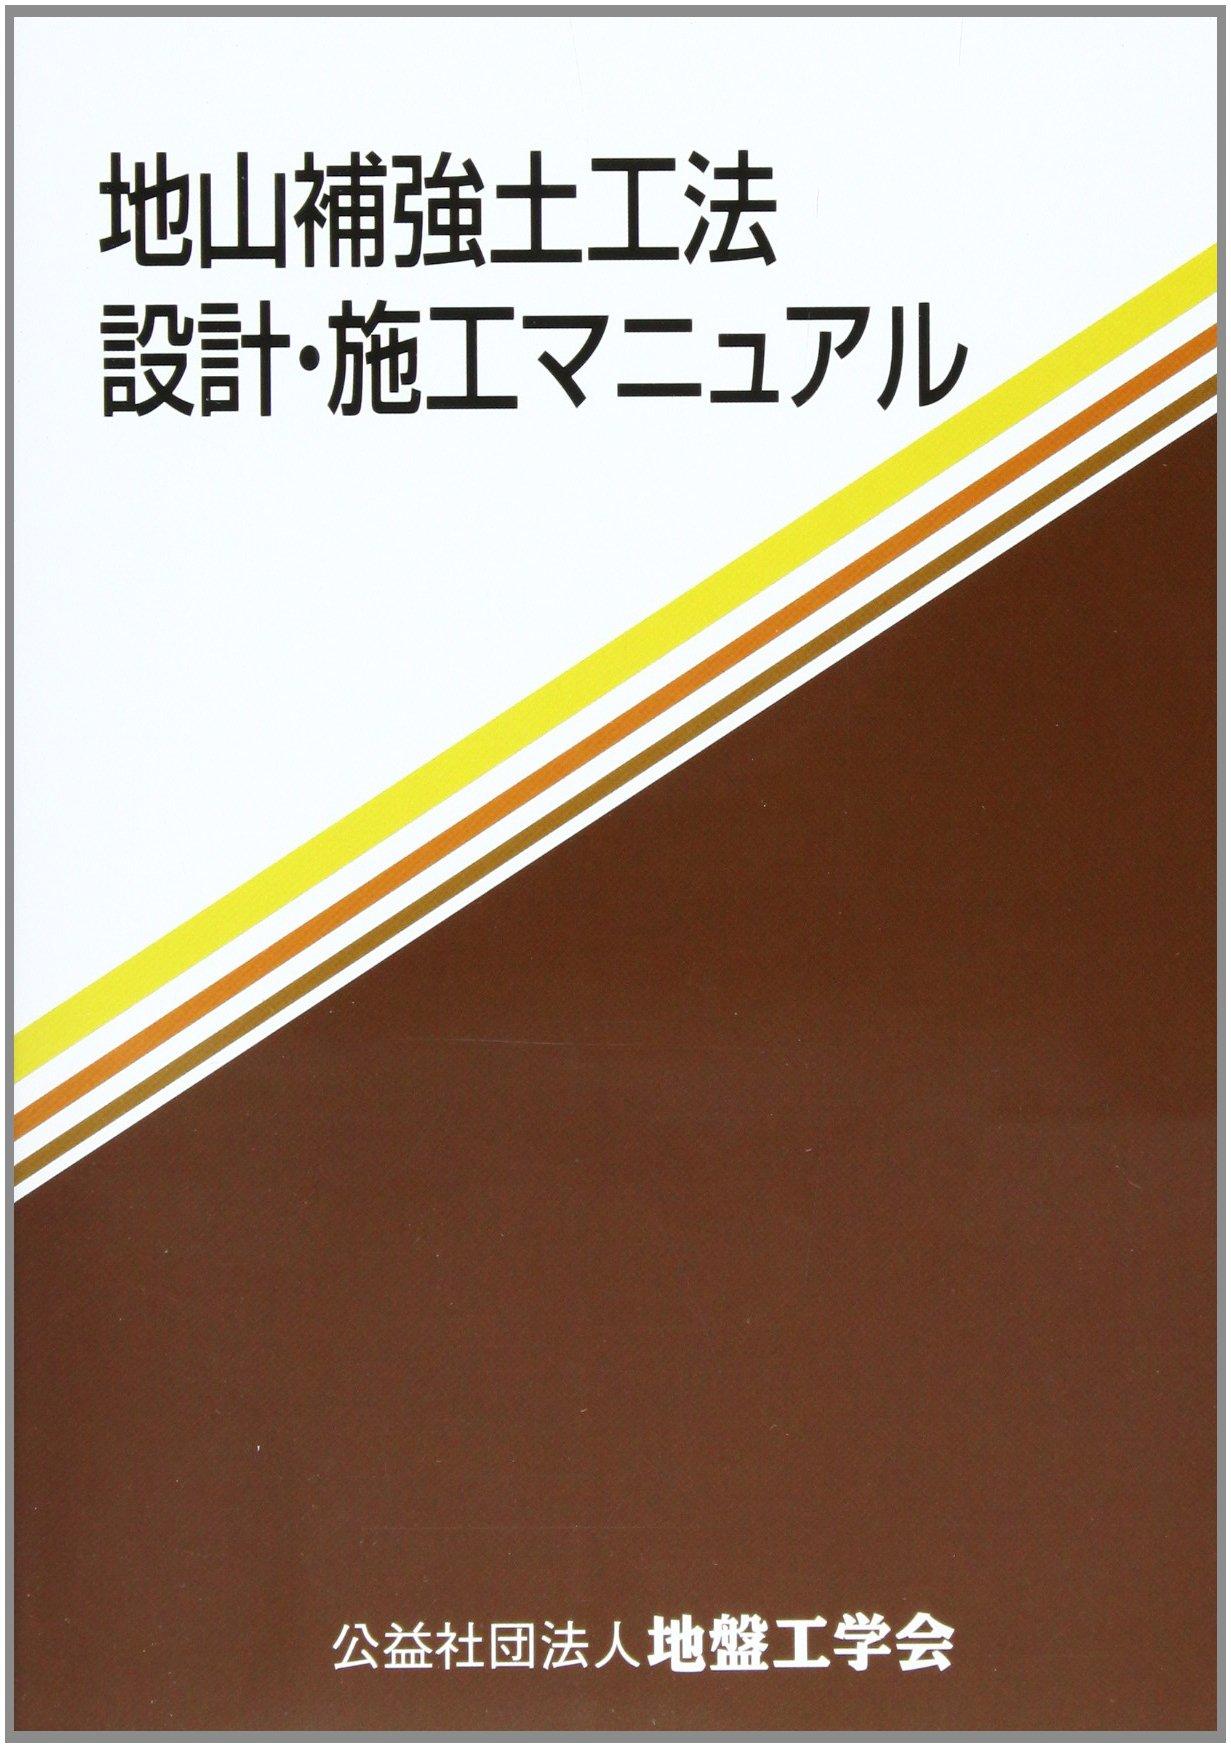 Ground reinforcement method earthwork design and construction manual (2011) ISBN: 4886440878 [Japanese Import] ebook